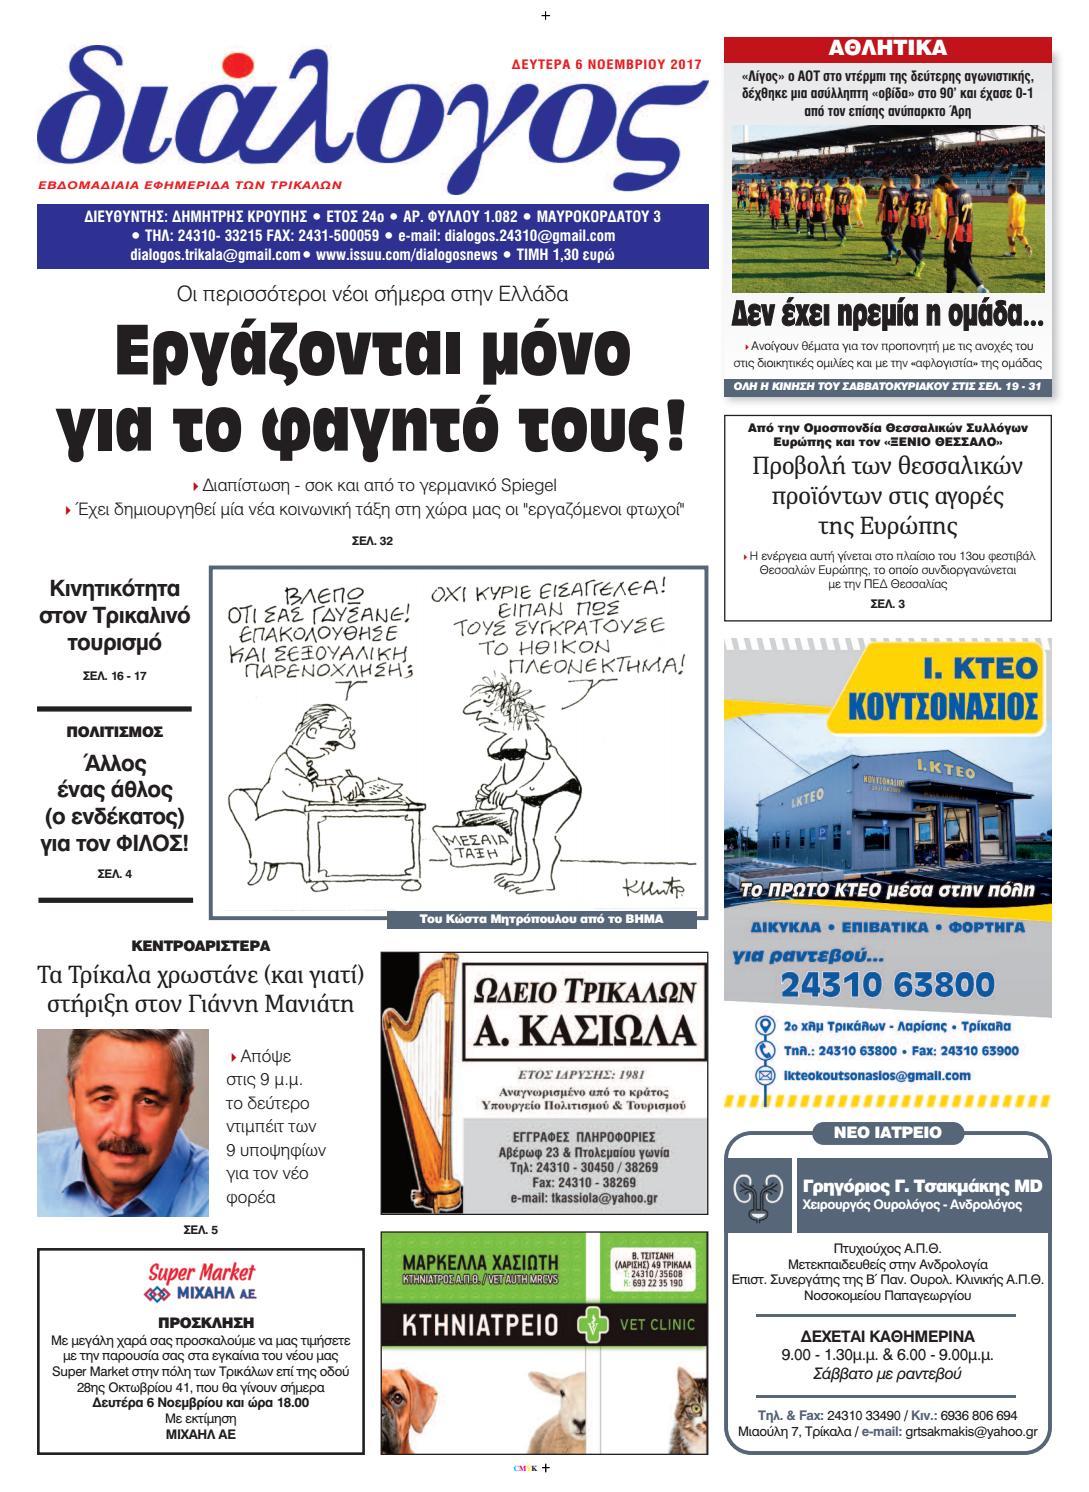 d5088503ad ΔΙΑΛΟΓΟΣ 6-11-2017 by διάλογος (dialogos) - issuu